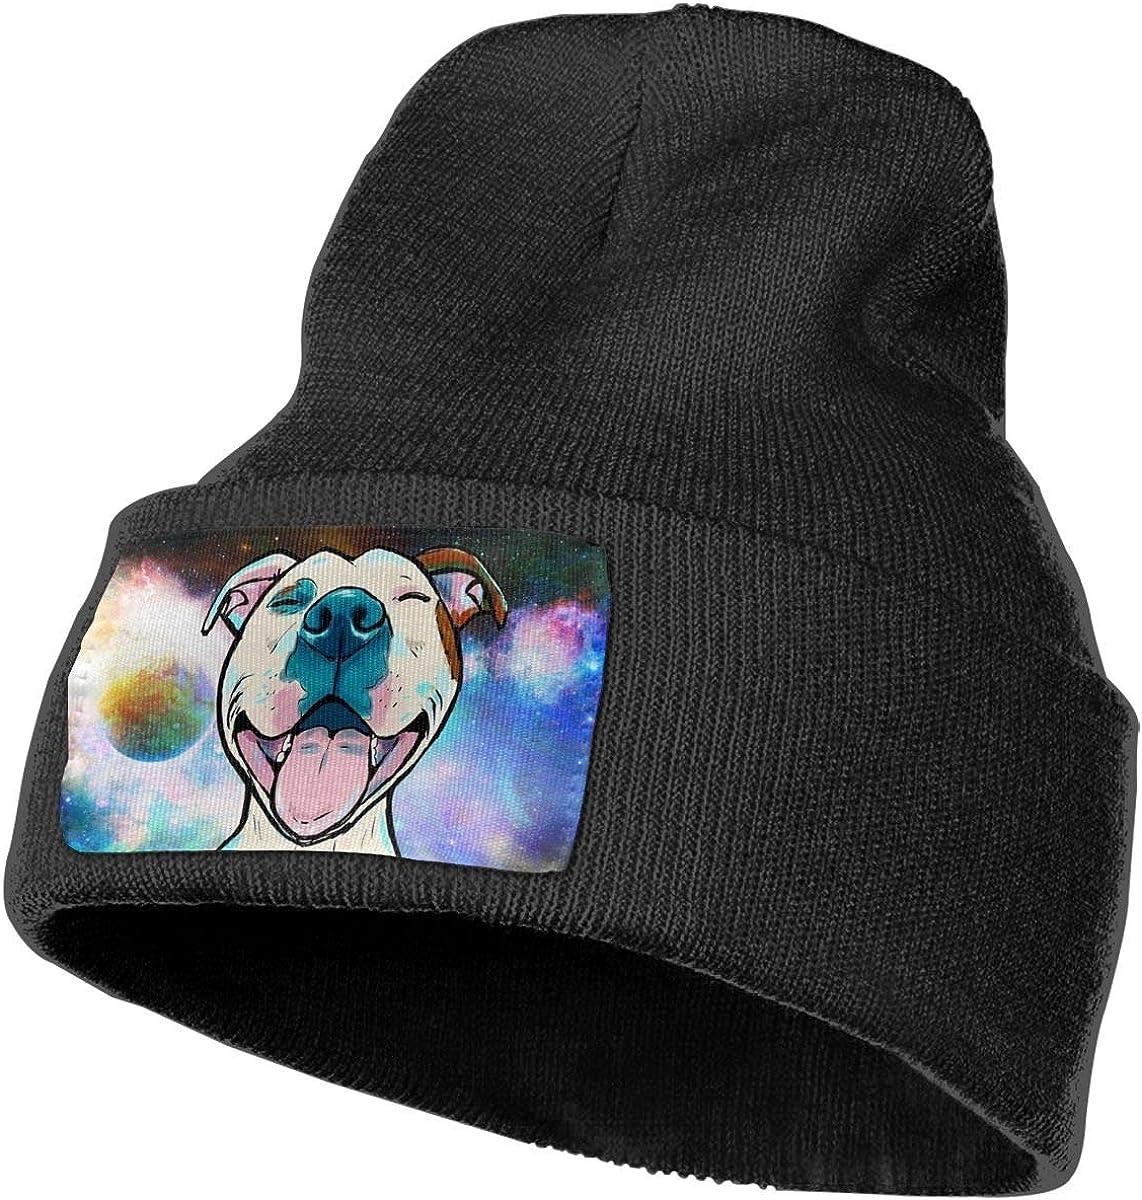 Pitbull Dog Beanie Hat Unisex Stylish Cap Serious Style Slouchy Hats